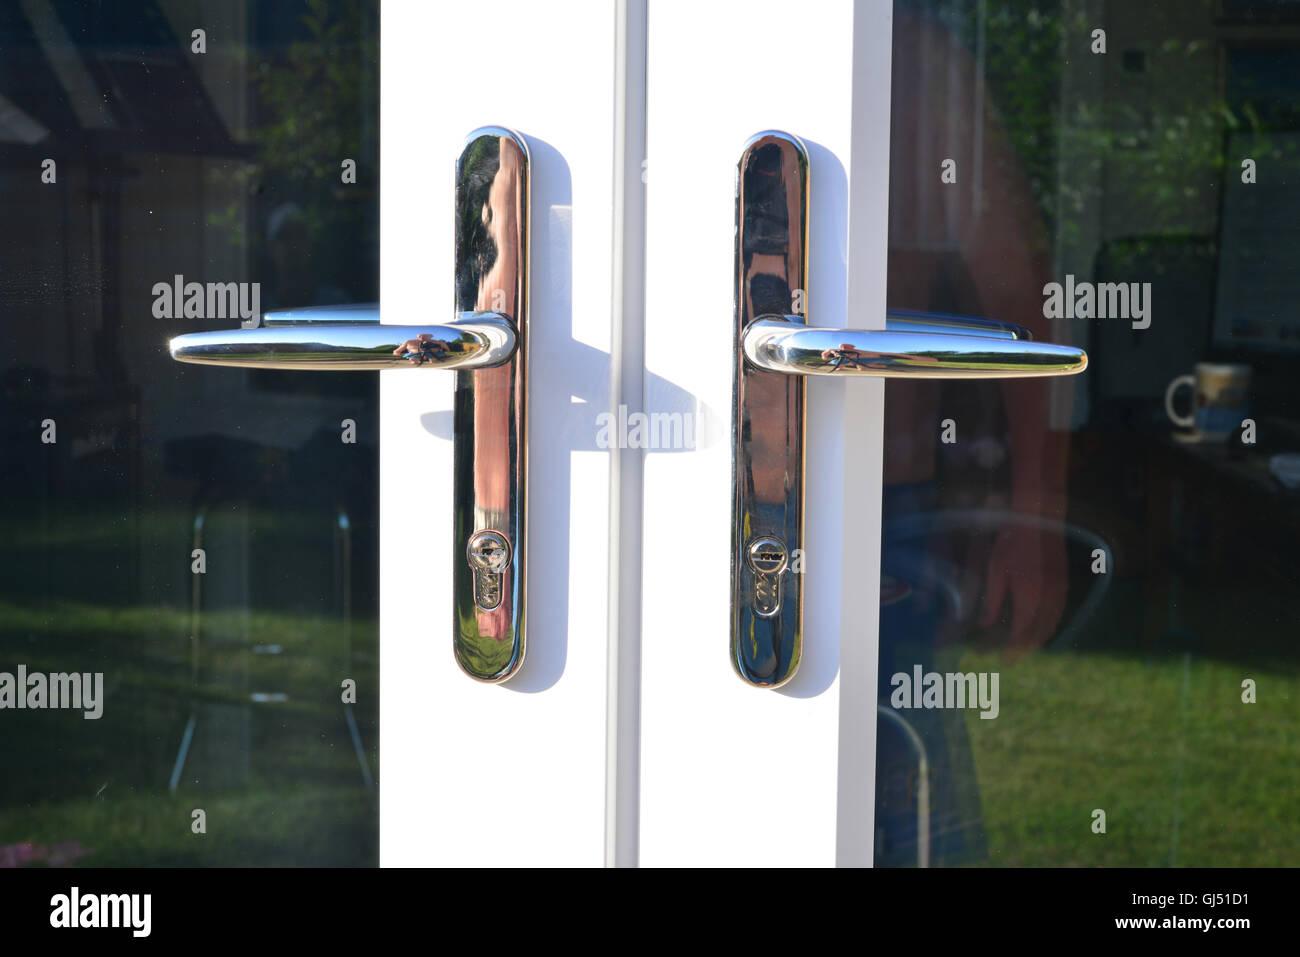 French door handles on French doors, - Stock Image